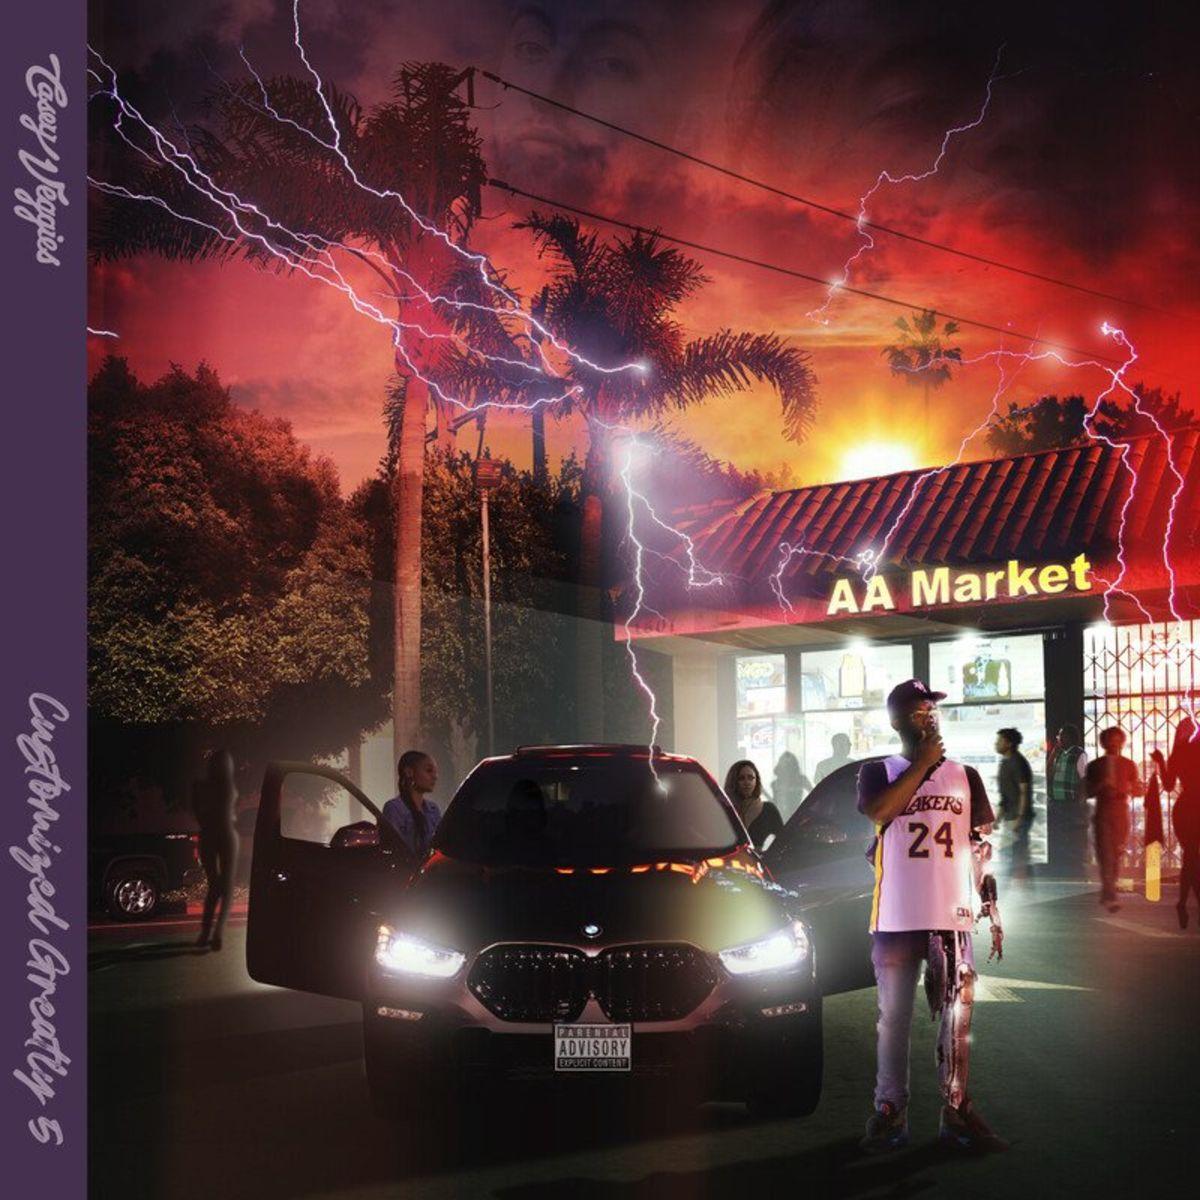 Art for Paper Cuts (Dirty) by Casey Veggies ft Wiz Khalifa